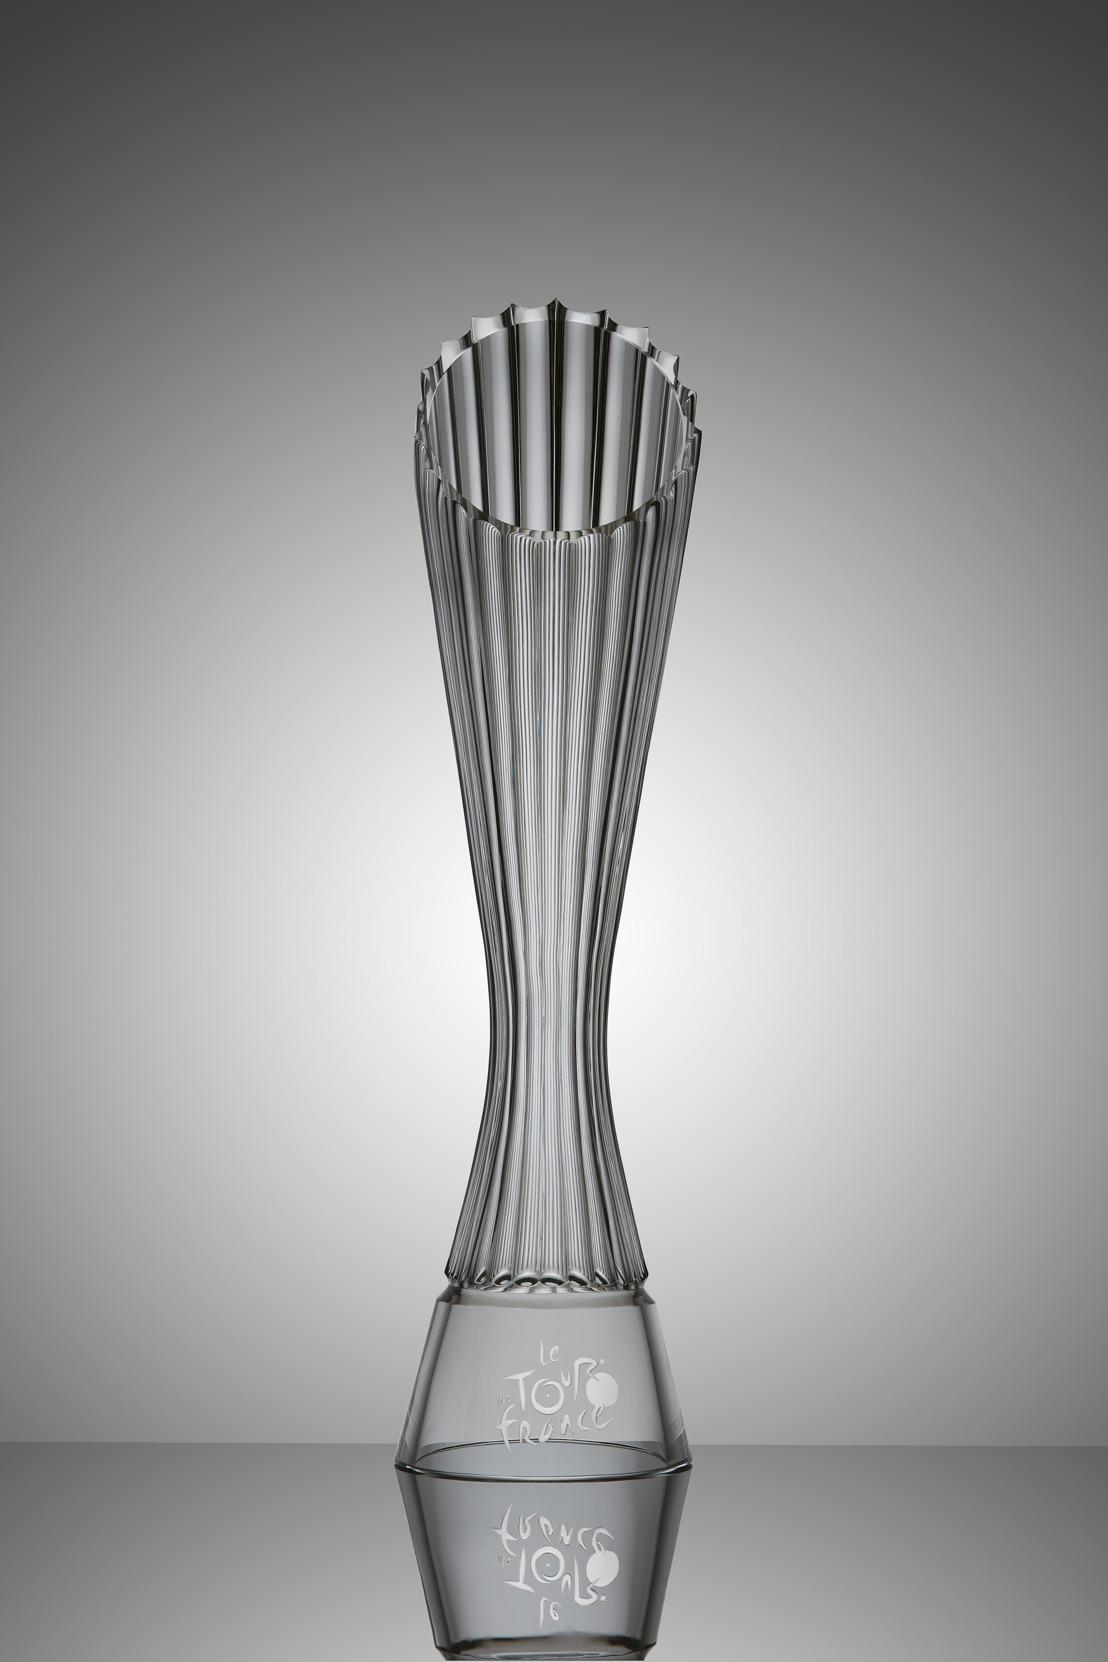 ŠKODA Design creates trophies for the winners of the 2018 Tour de France